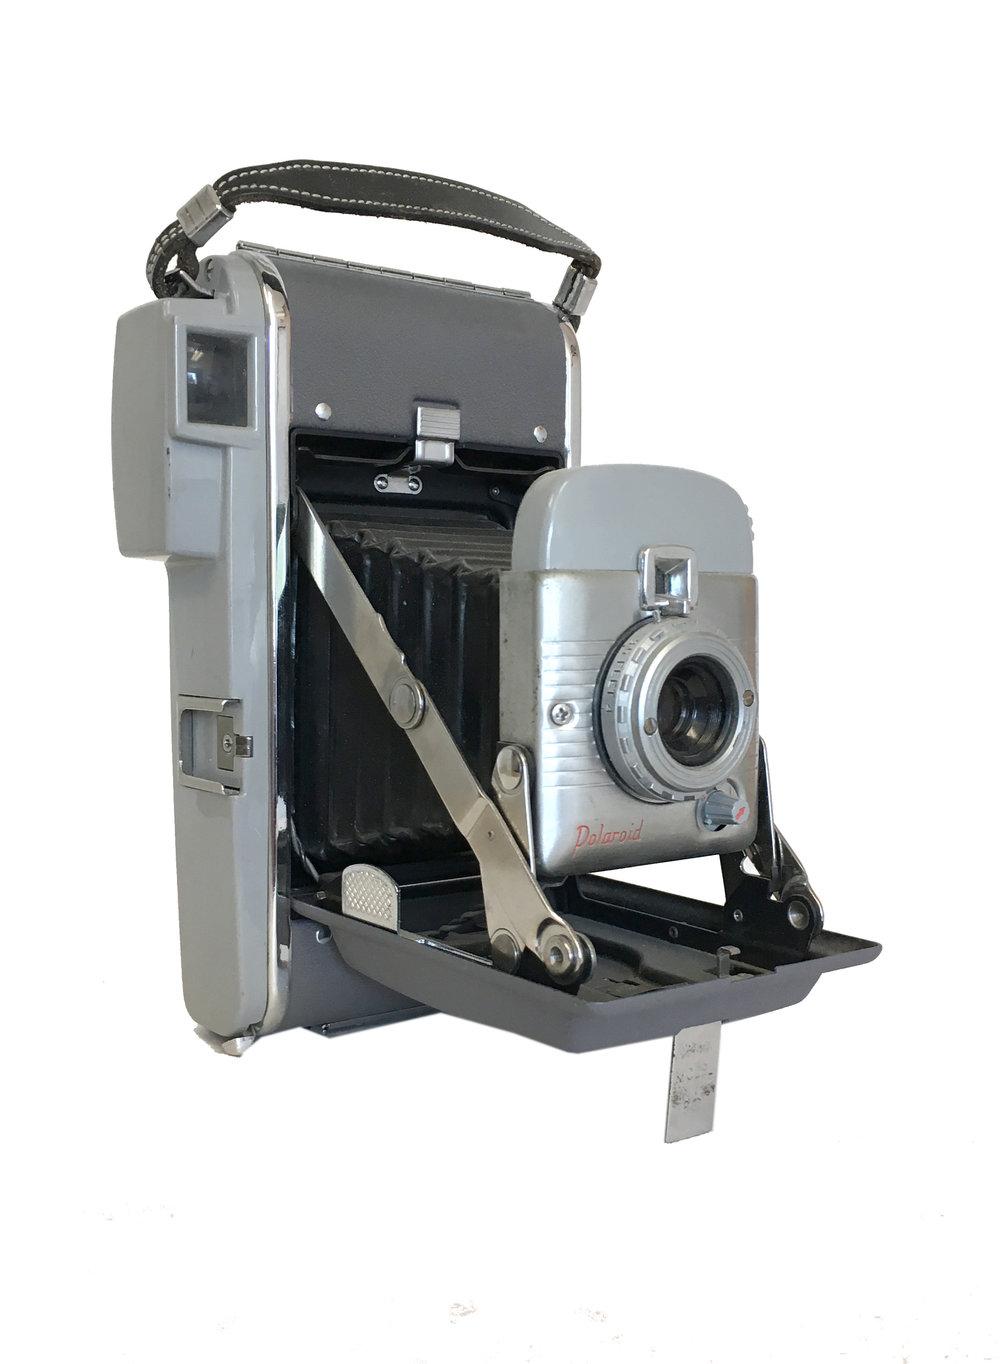 Polaroid Model 80.jpg